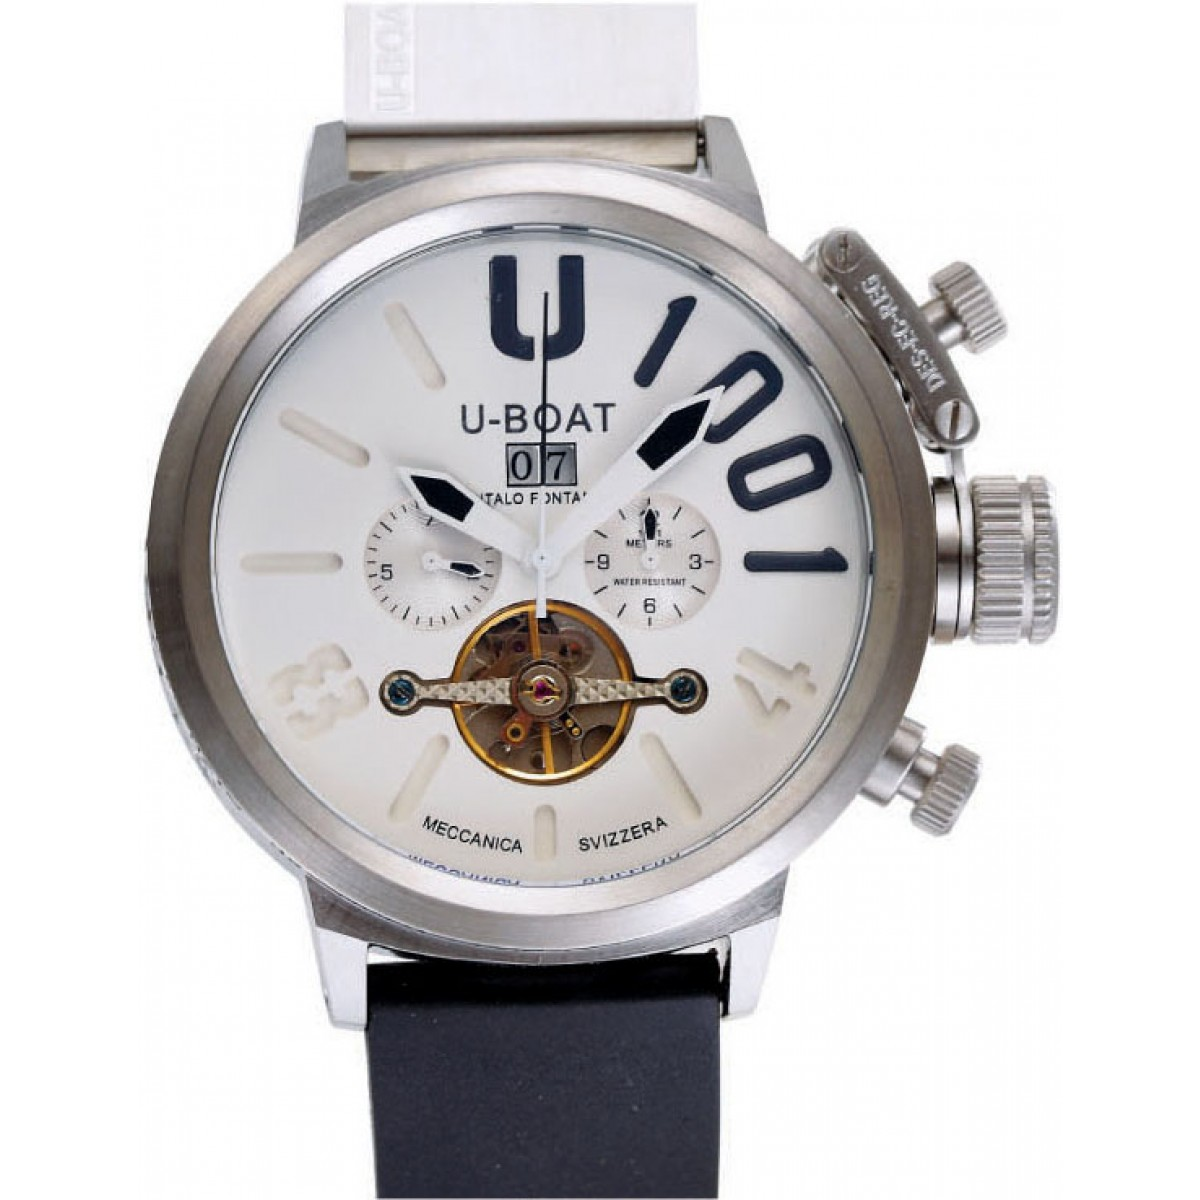 308a4ad31cb Relógio Réplica U-Boat U-1001 Branco